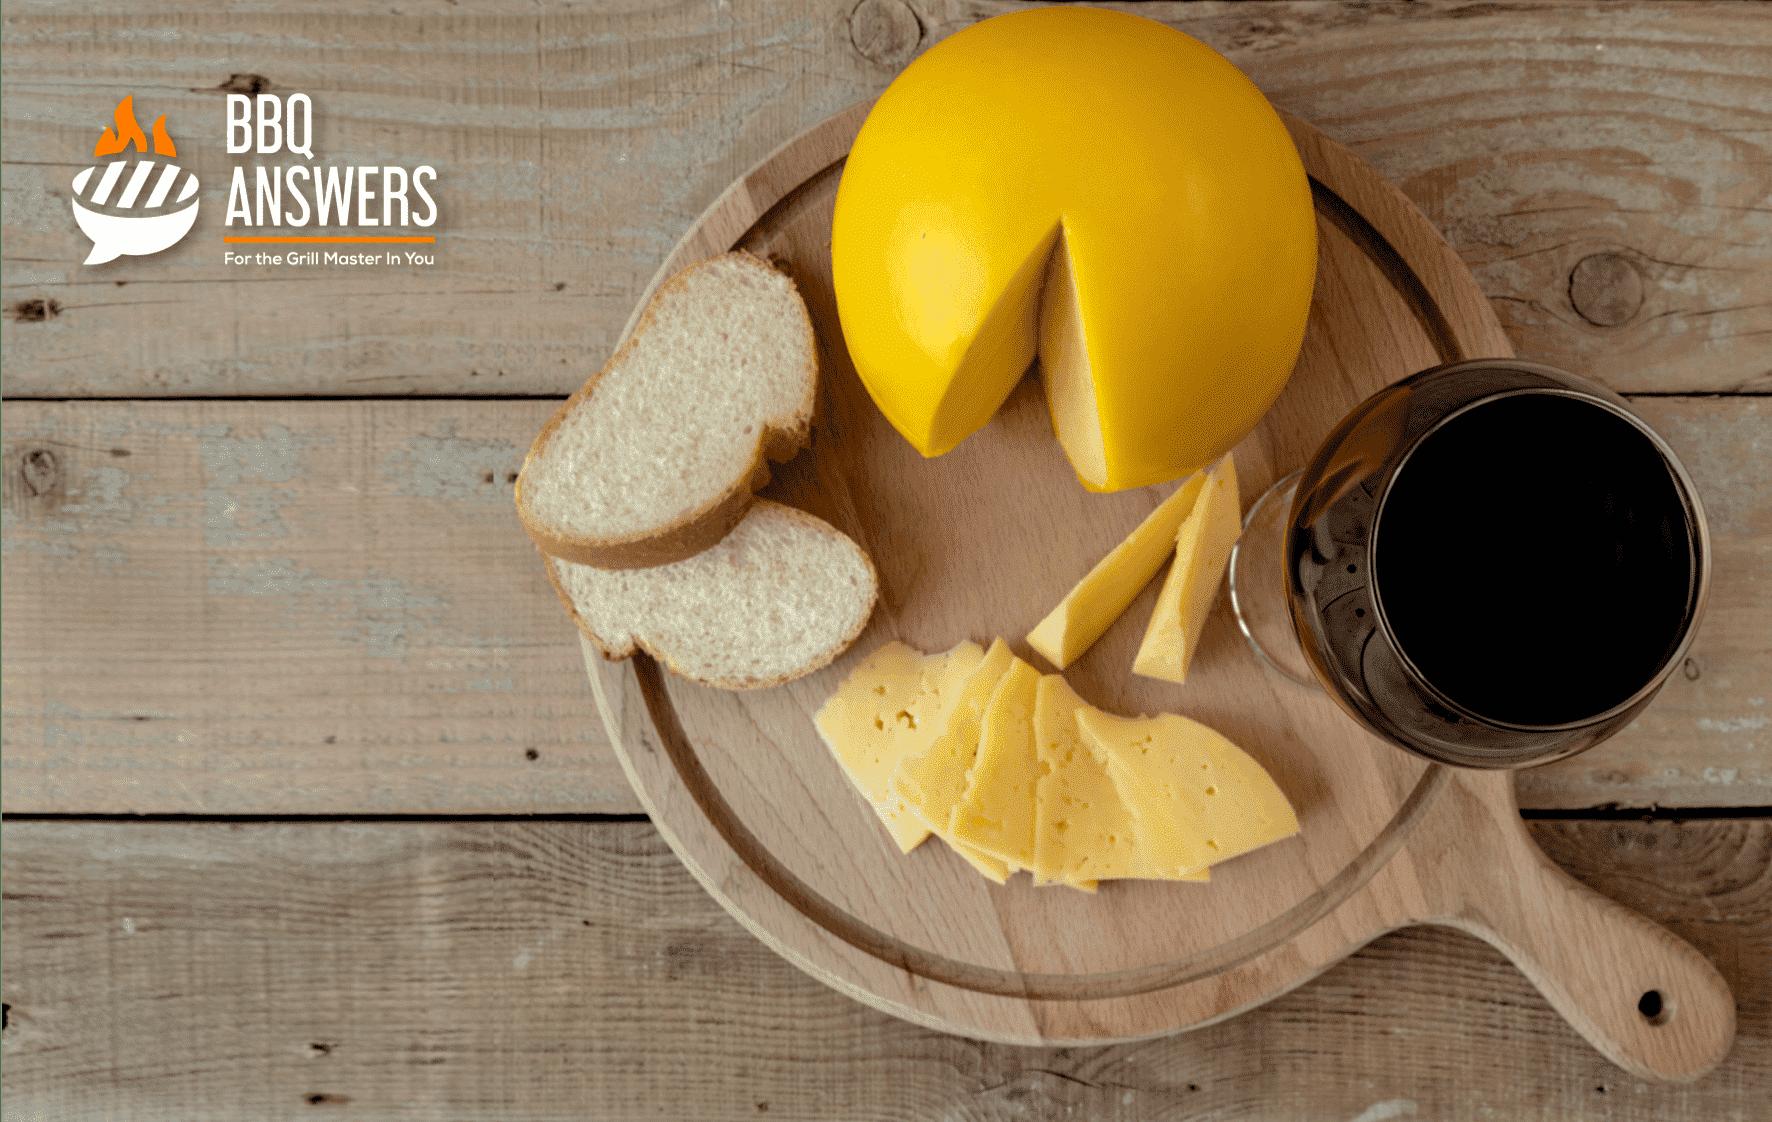 Vegan Cheddar Cheese | BBQanswers